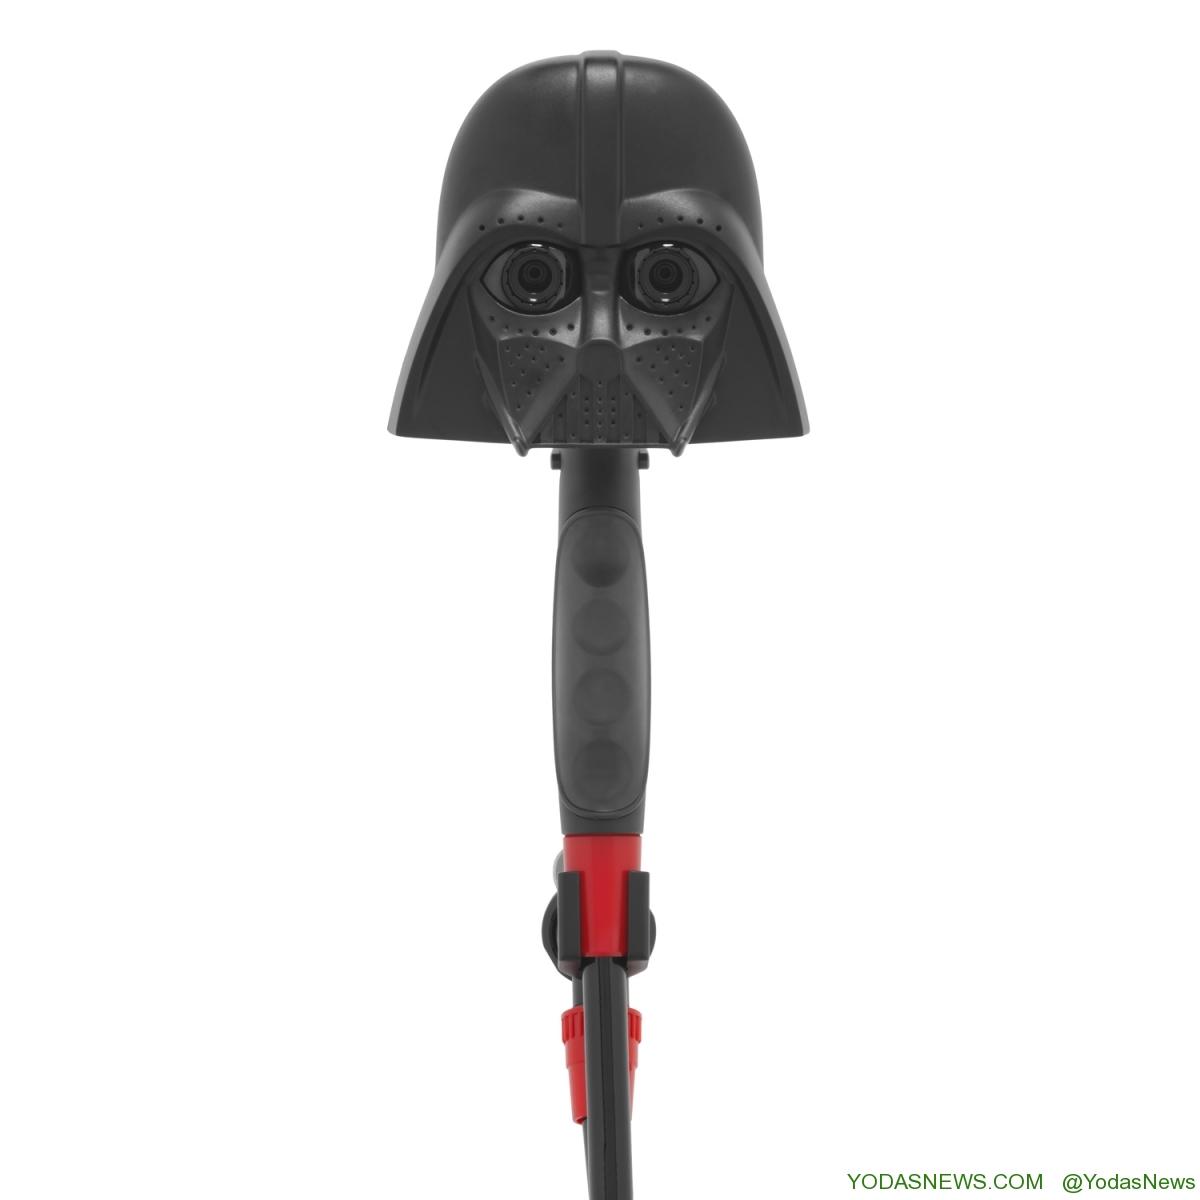 Darth Vader HH Front wHolder. Darth Vader HH Right.  Darth Vader HH Right wHolder 540b75d383